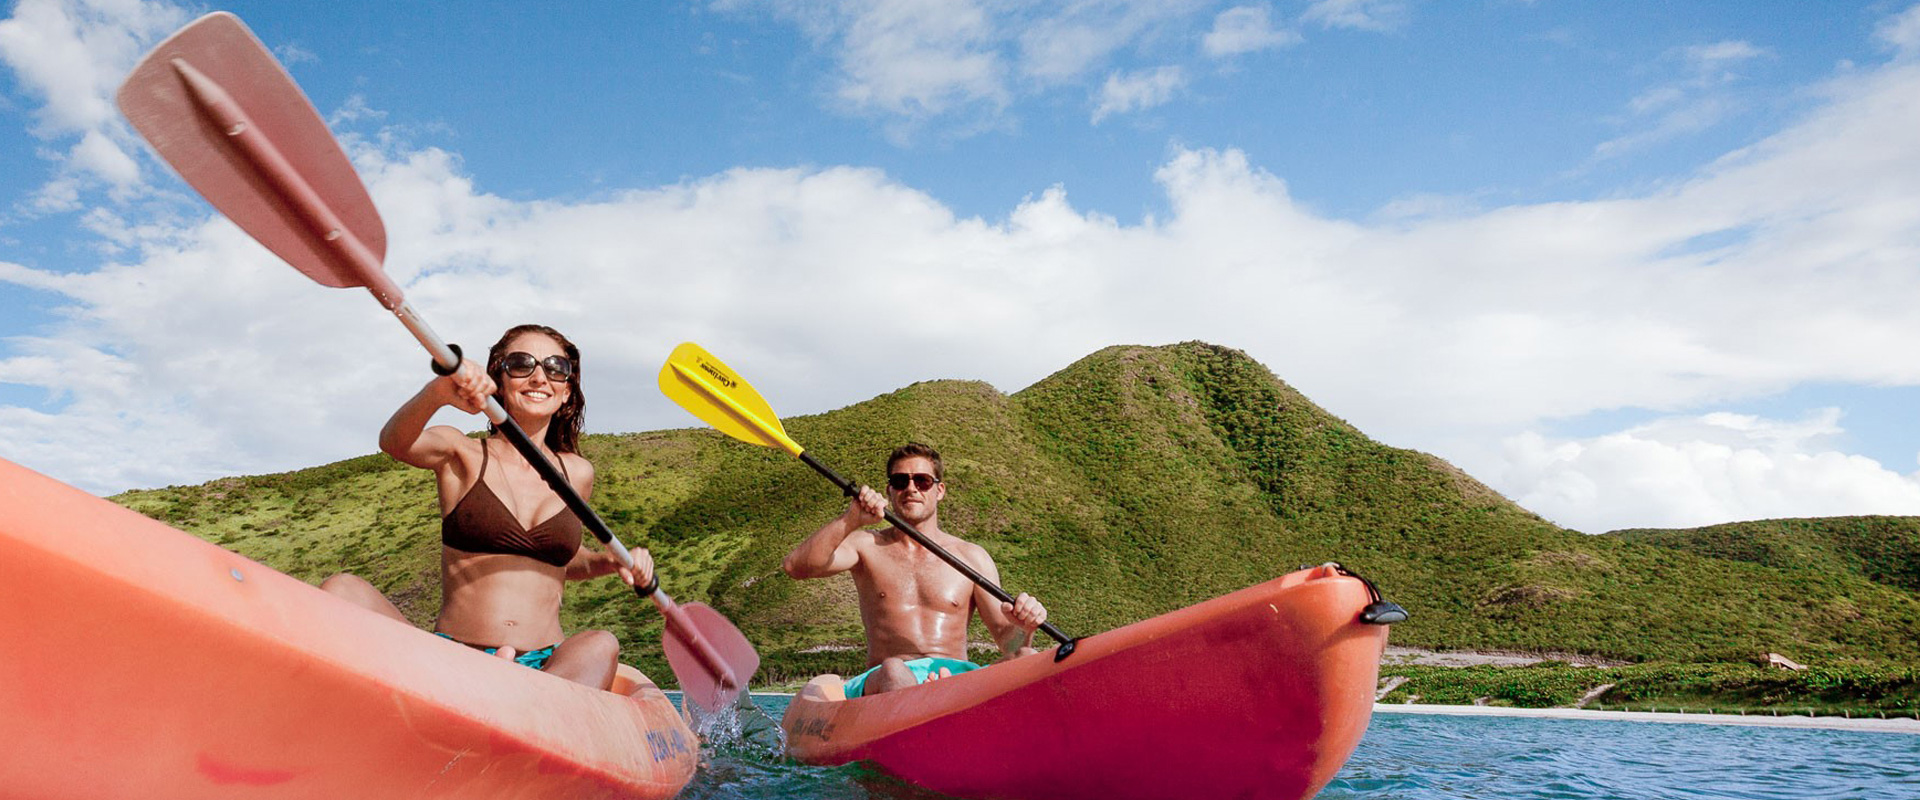 Group enjoying Kayak Tour in St. Kitts and Nevis